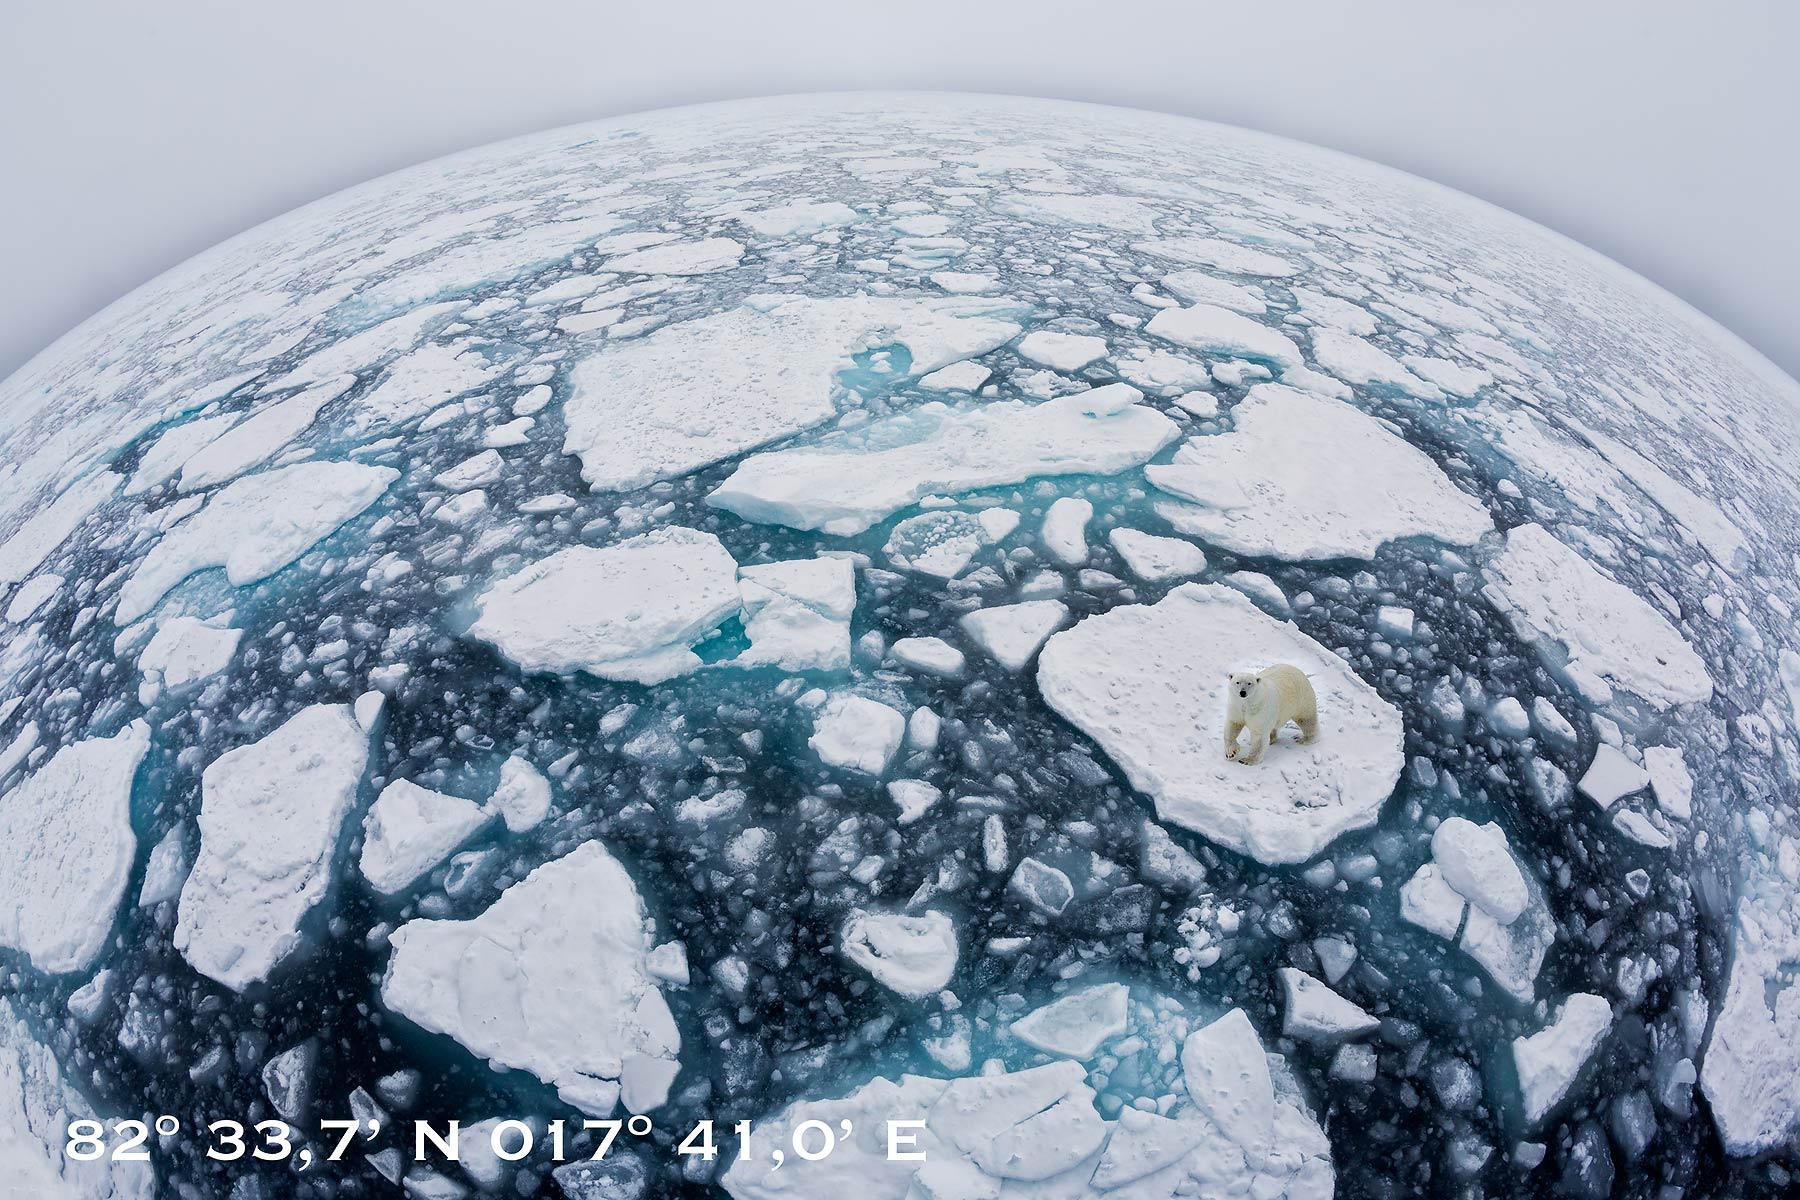 World-of-sea-ice-II-with-polar-bear-&-text_S6A3388-Sea-ice-at-82-degree-North,-Svalbard,-Arctic.jpg